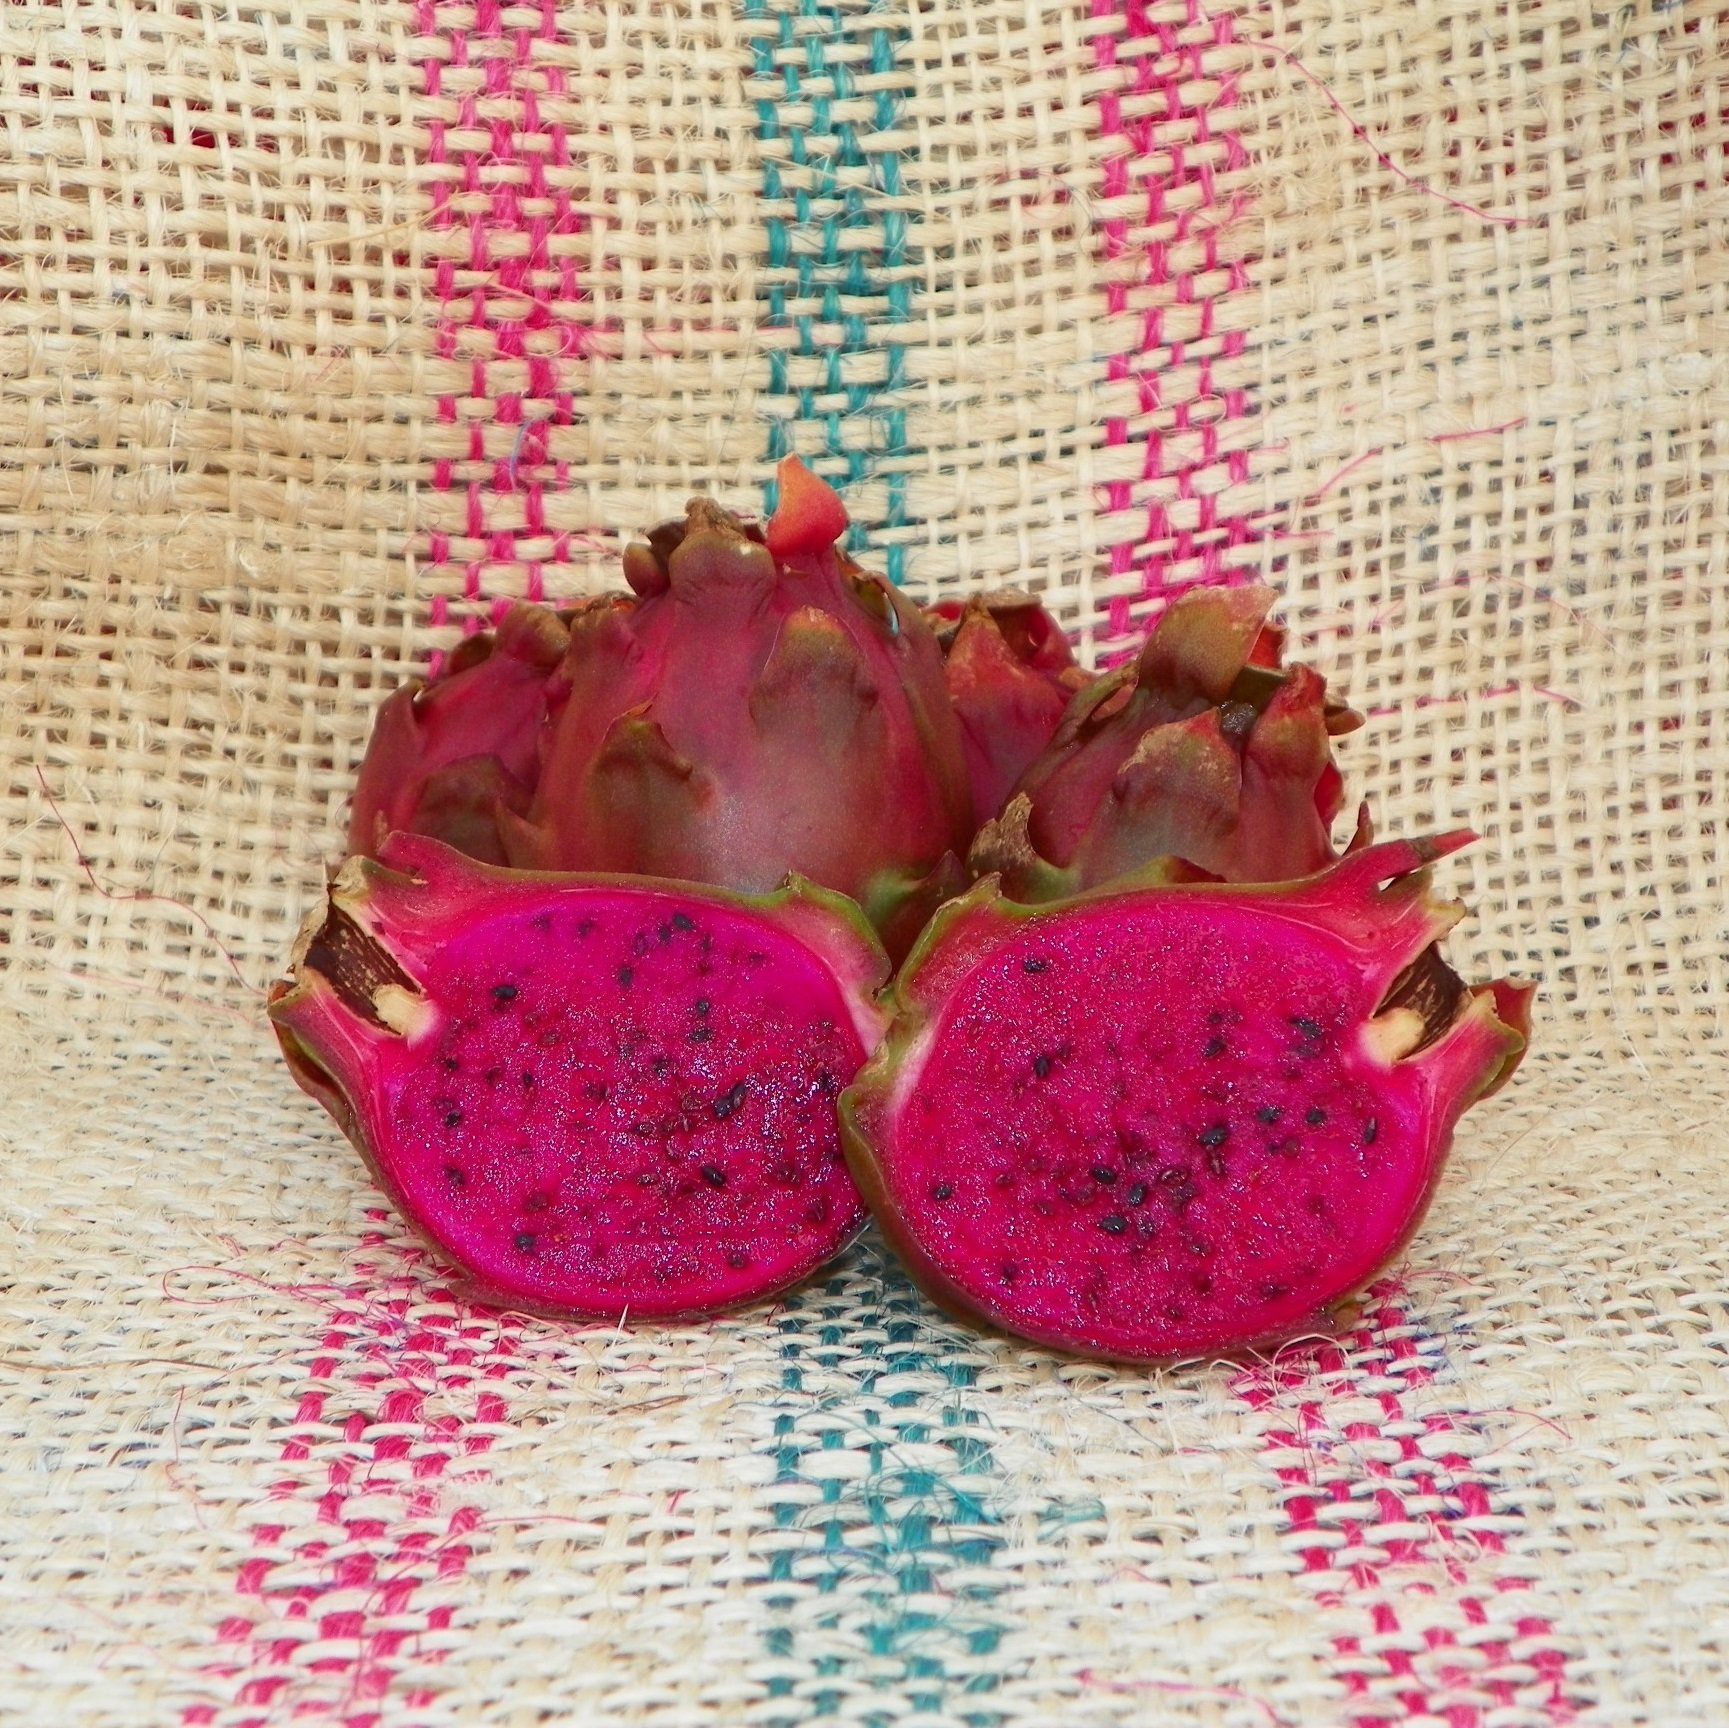 Dragon Fruit variety Neon fruit Spicy Exotics